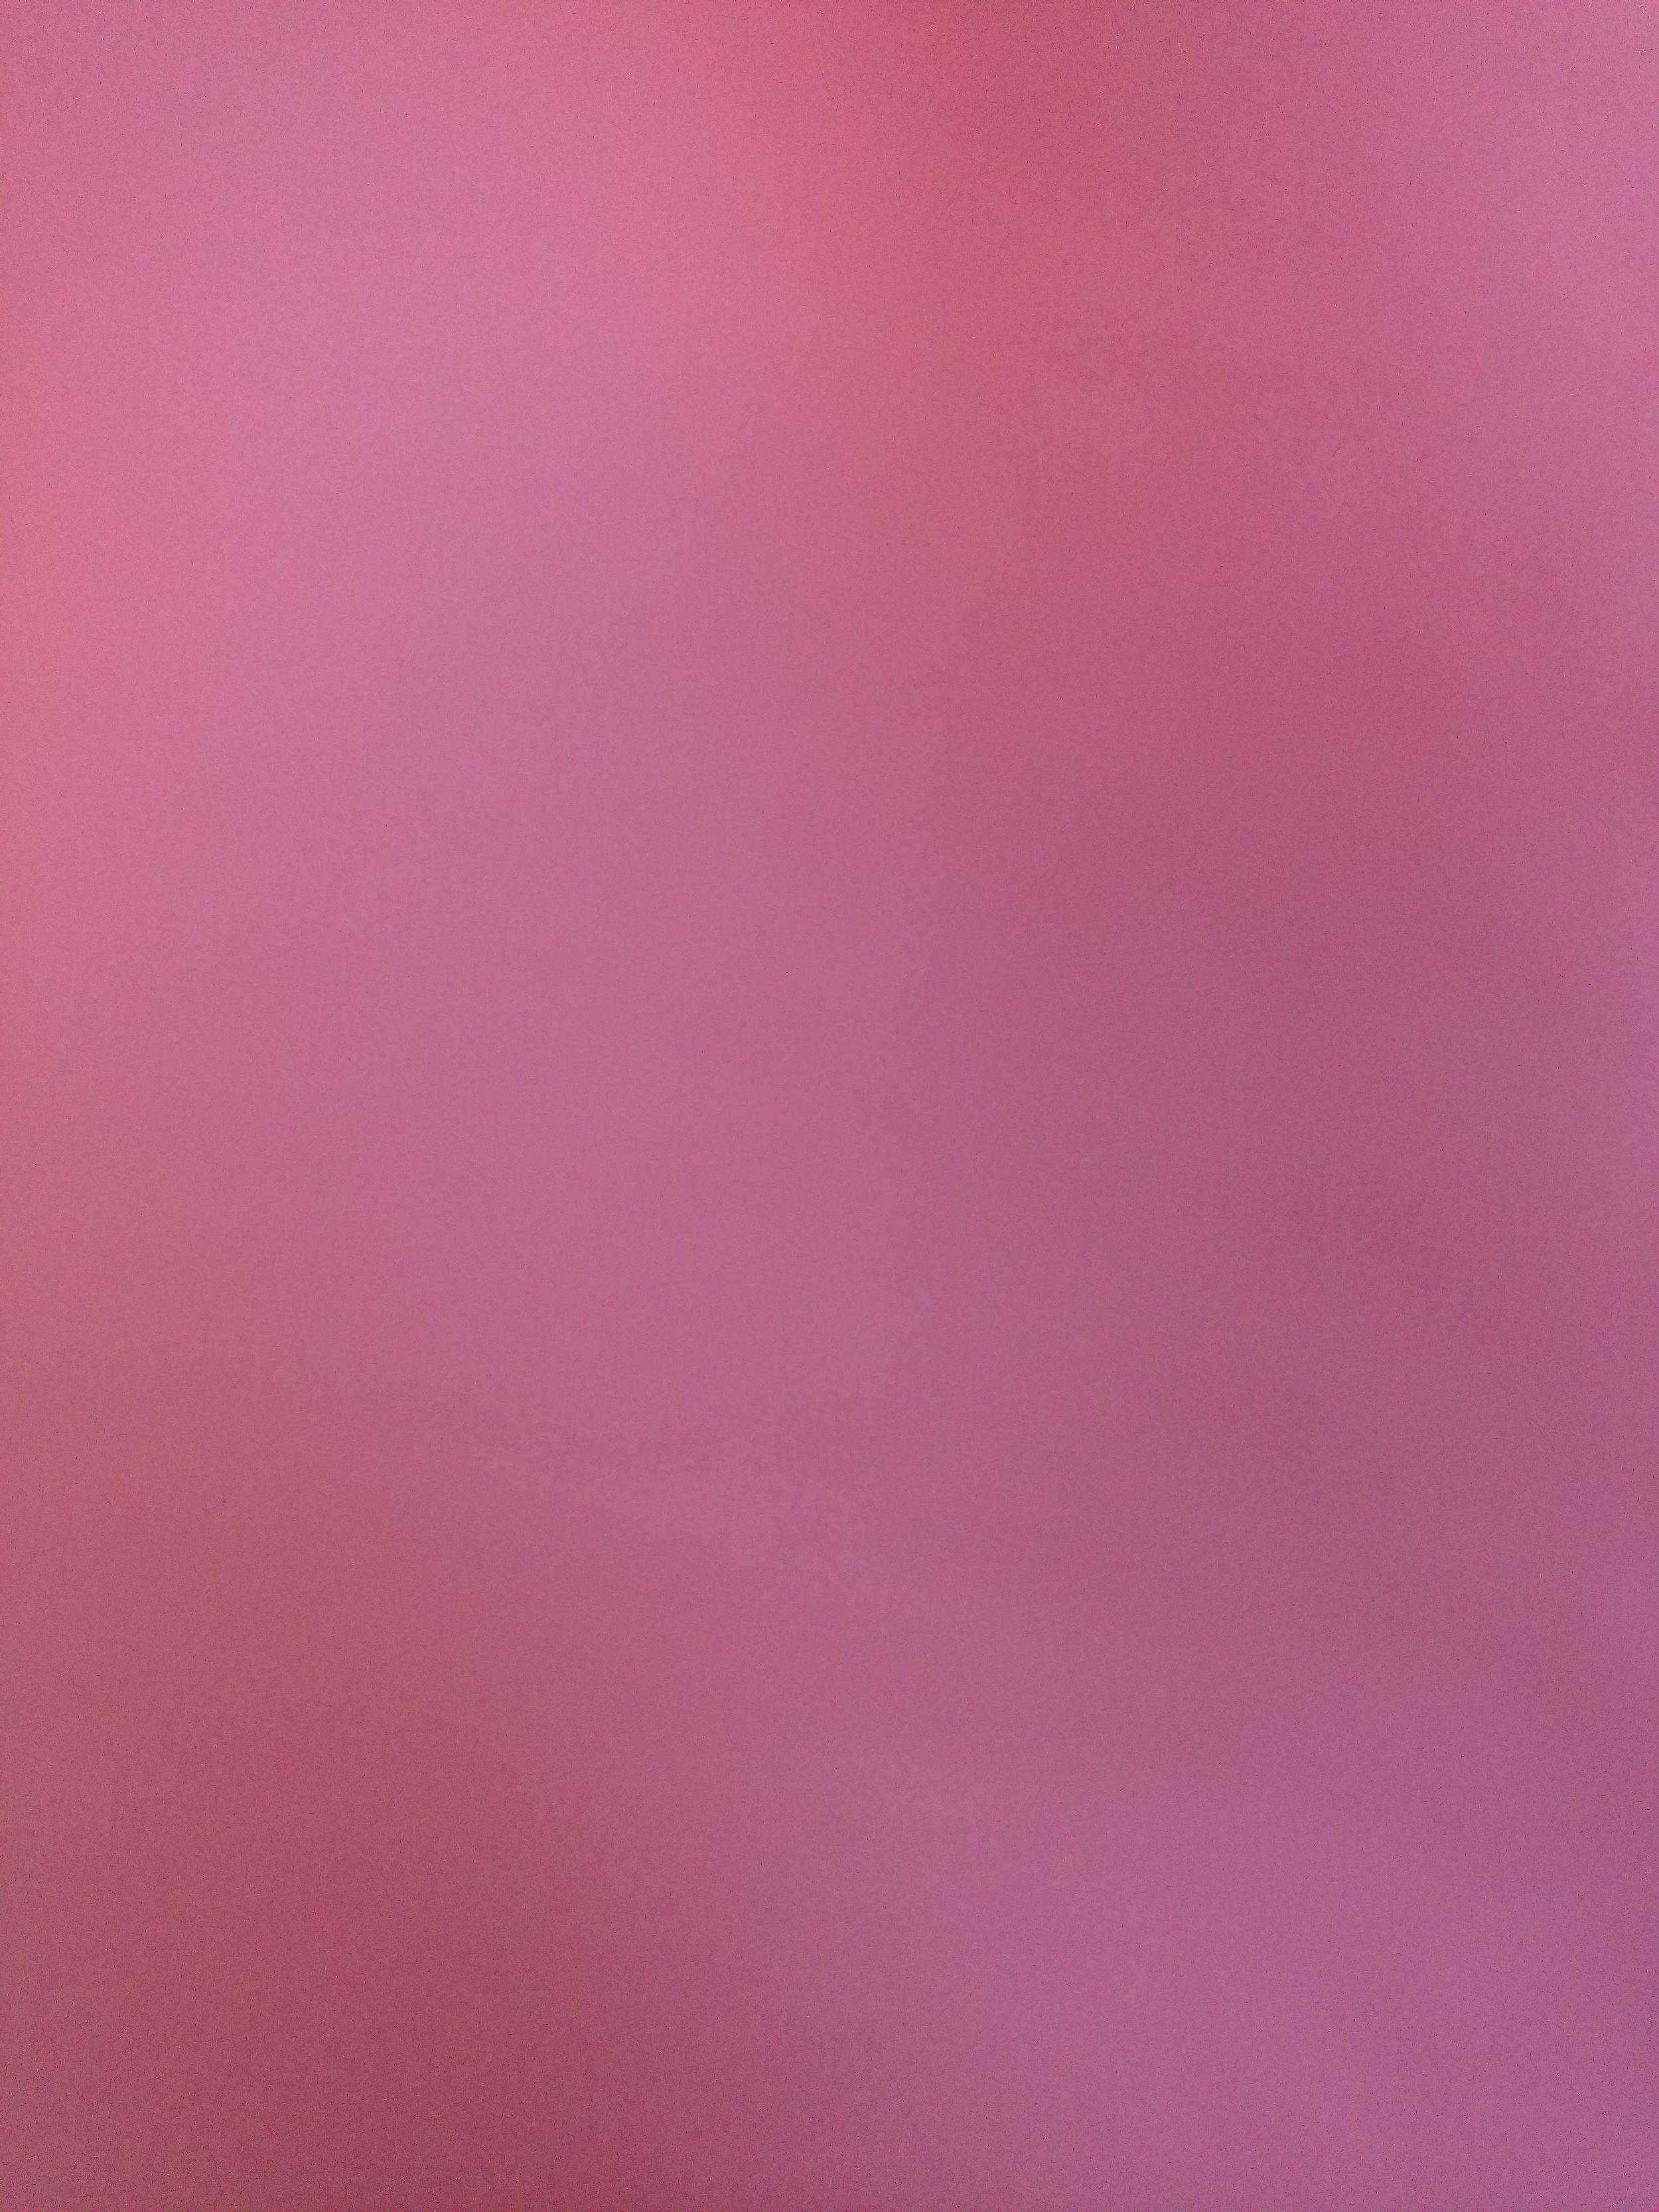 willroth-co-free-texture-gradient-096.jpg